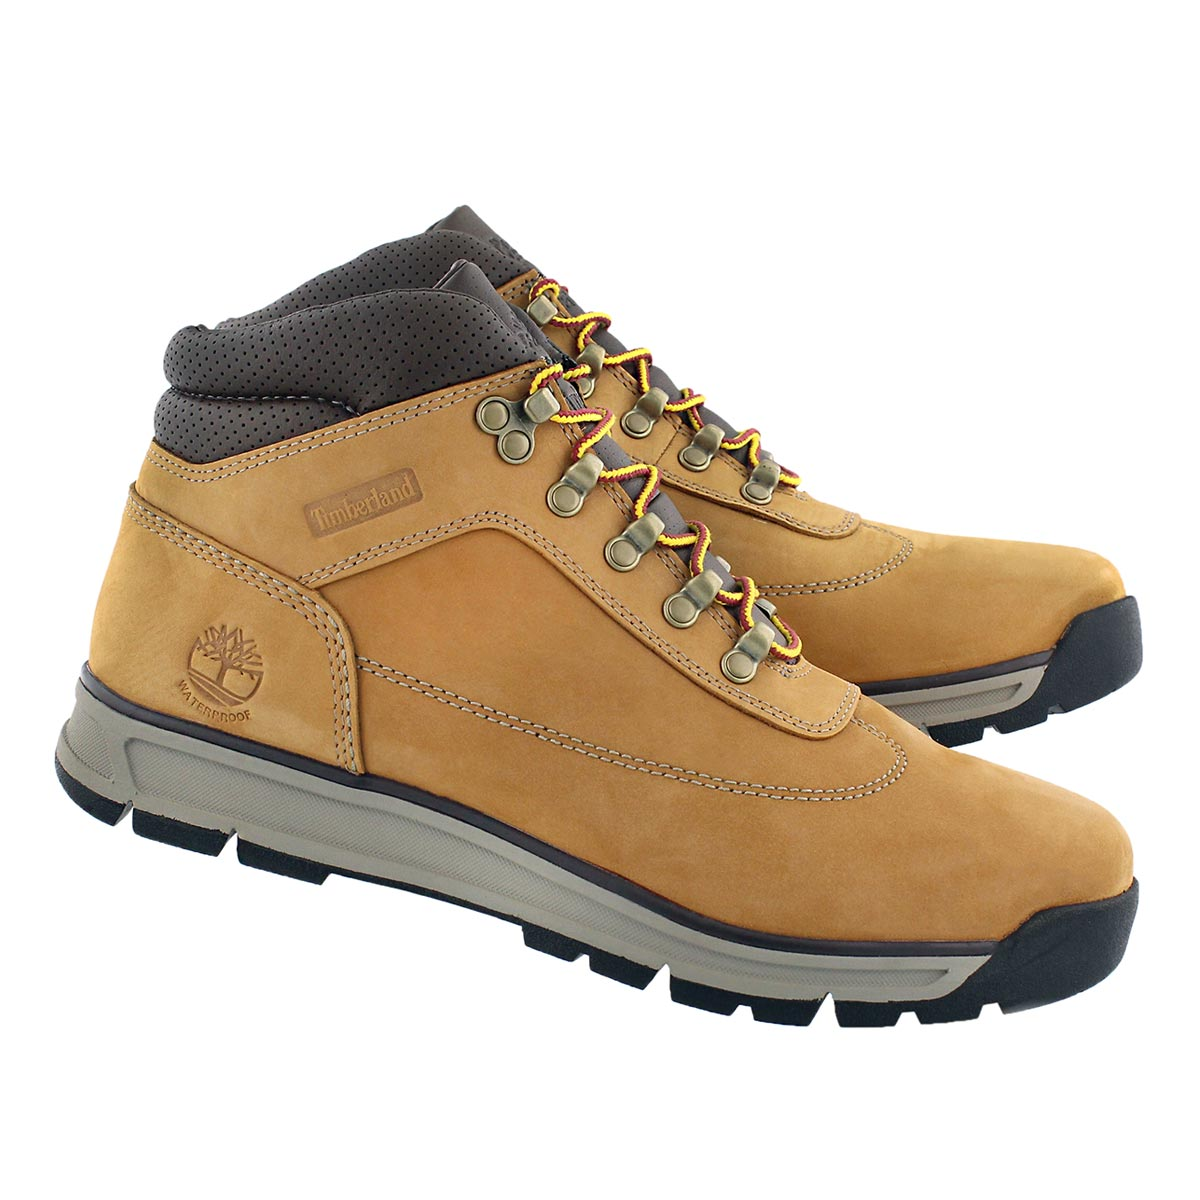 Mns Field Guide wheat wtpf hiking boot